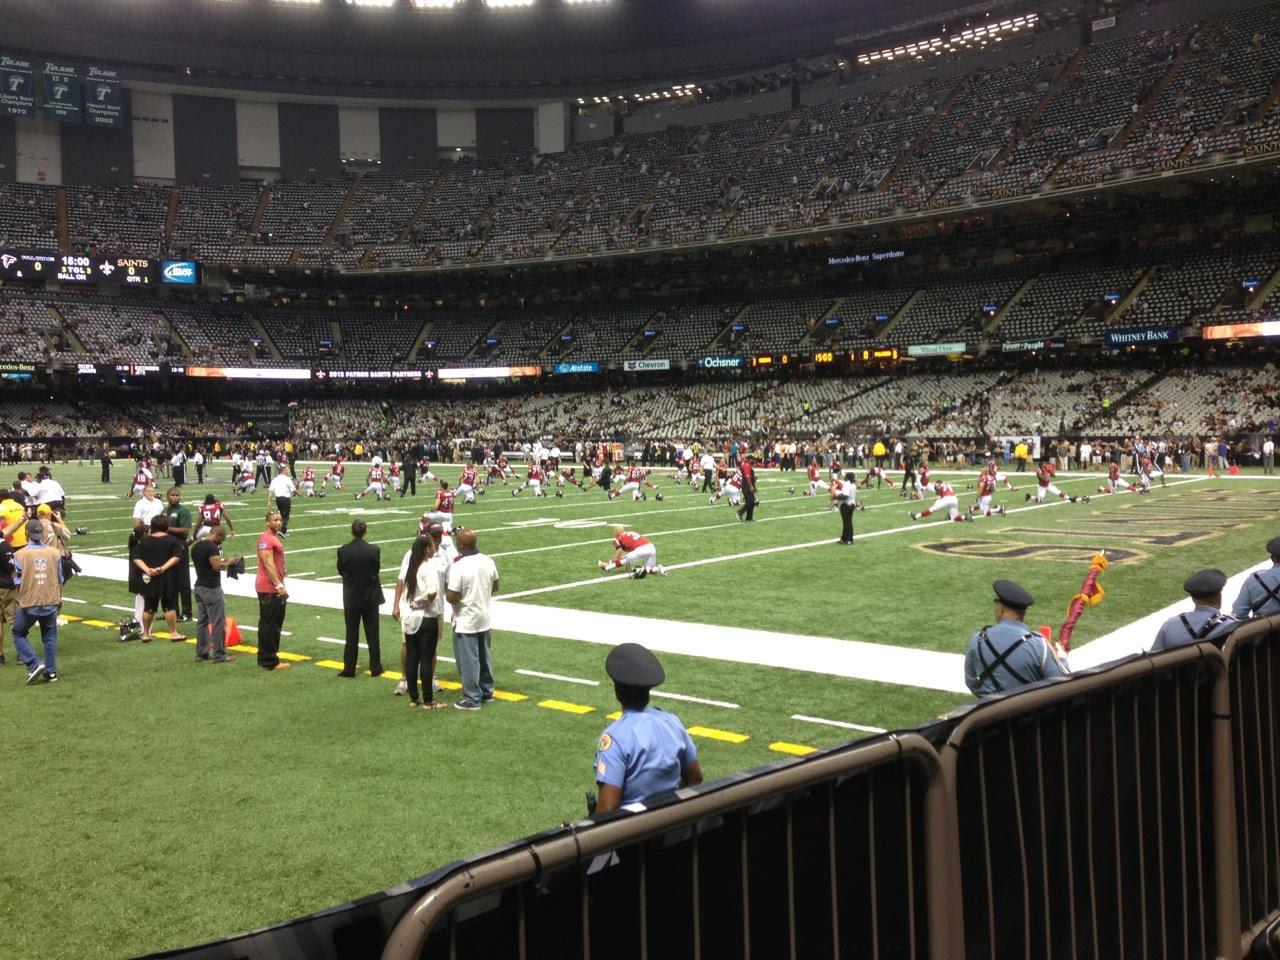 Mercedes-Benz Superdome section 104 row 2 seat 20 - New Orleans Saints vs Atlanta Falcons